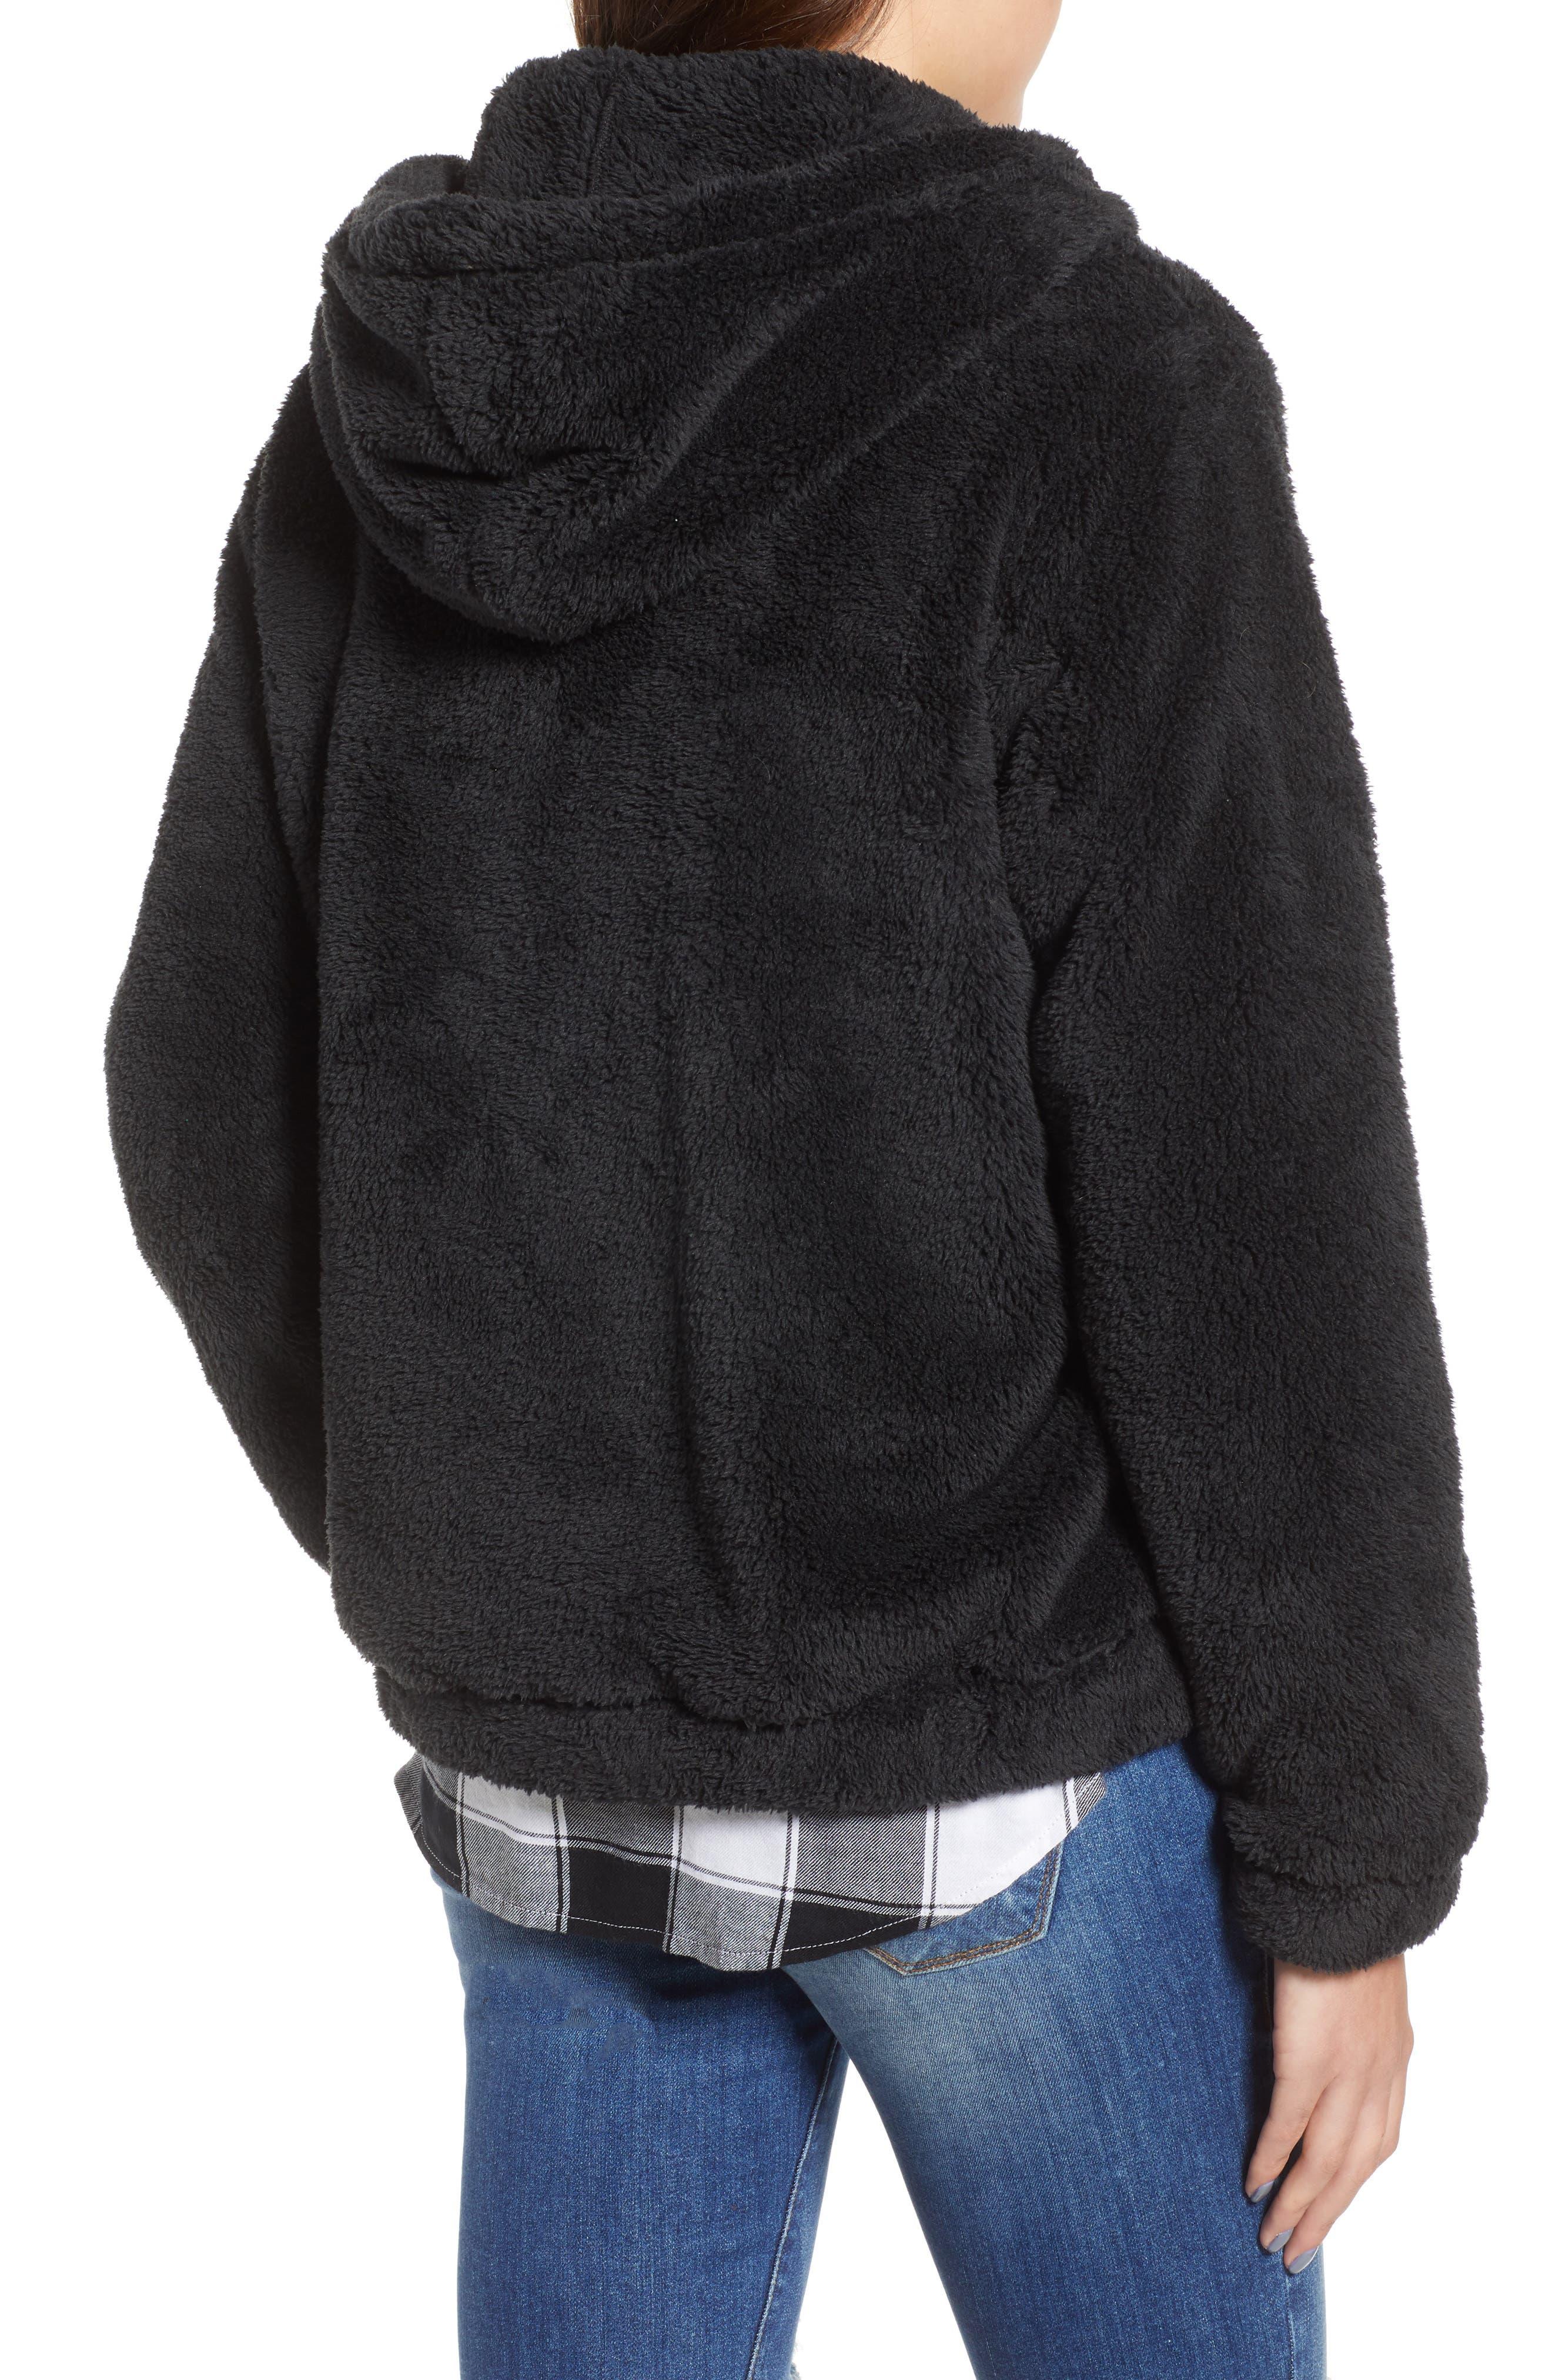 BILLABONG, Cozy For Keeps Fleece Pullover, Alternate thumbnail 2, color, 001